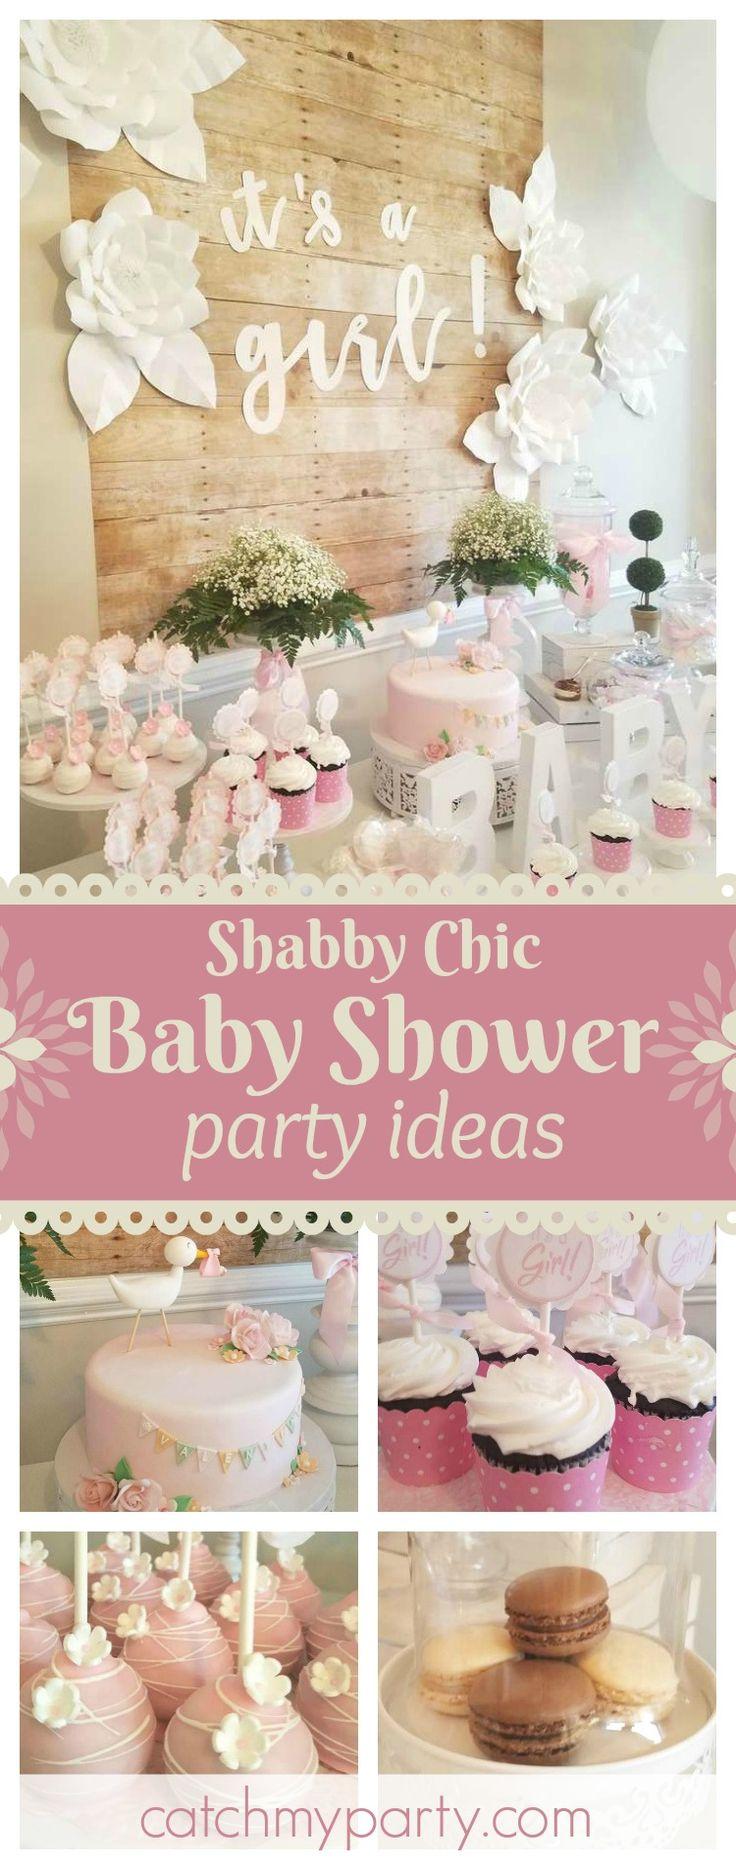 Best 25+ Shabby chic baby shower ideas on Pinterest